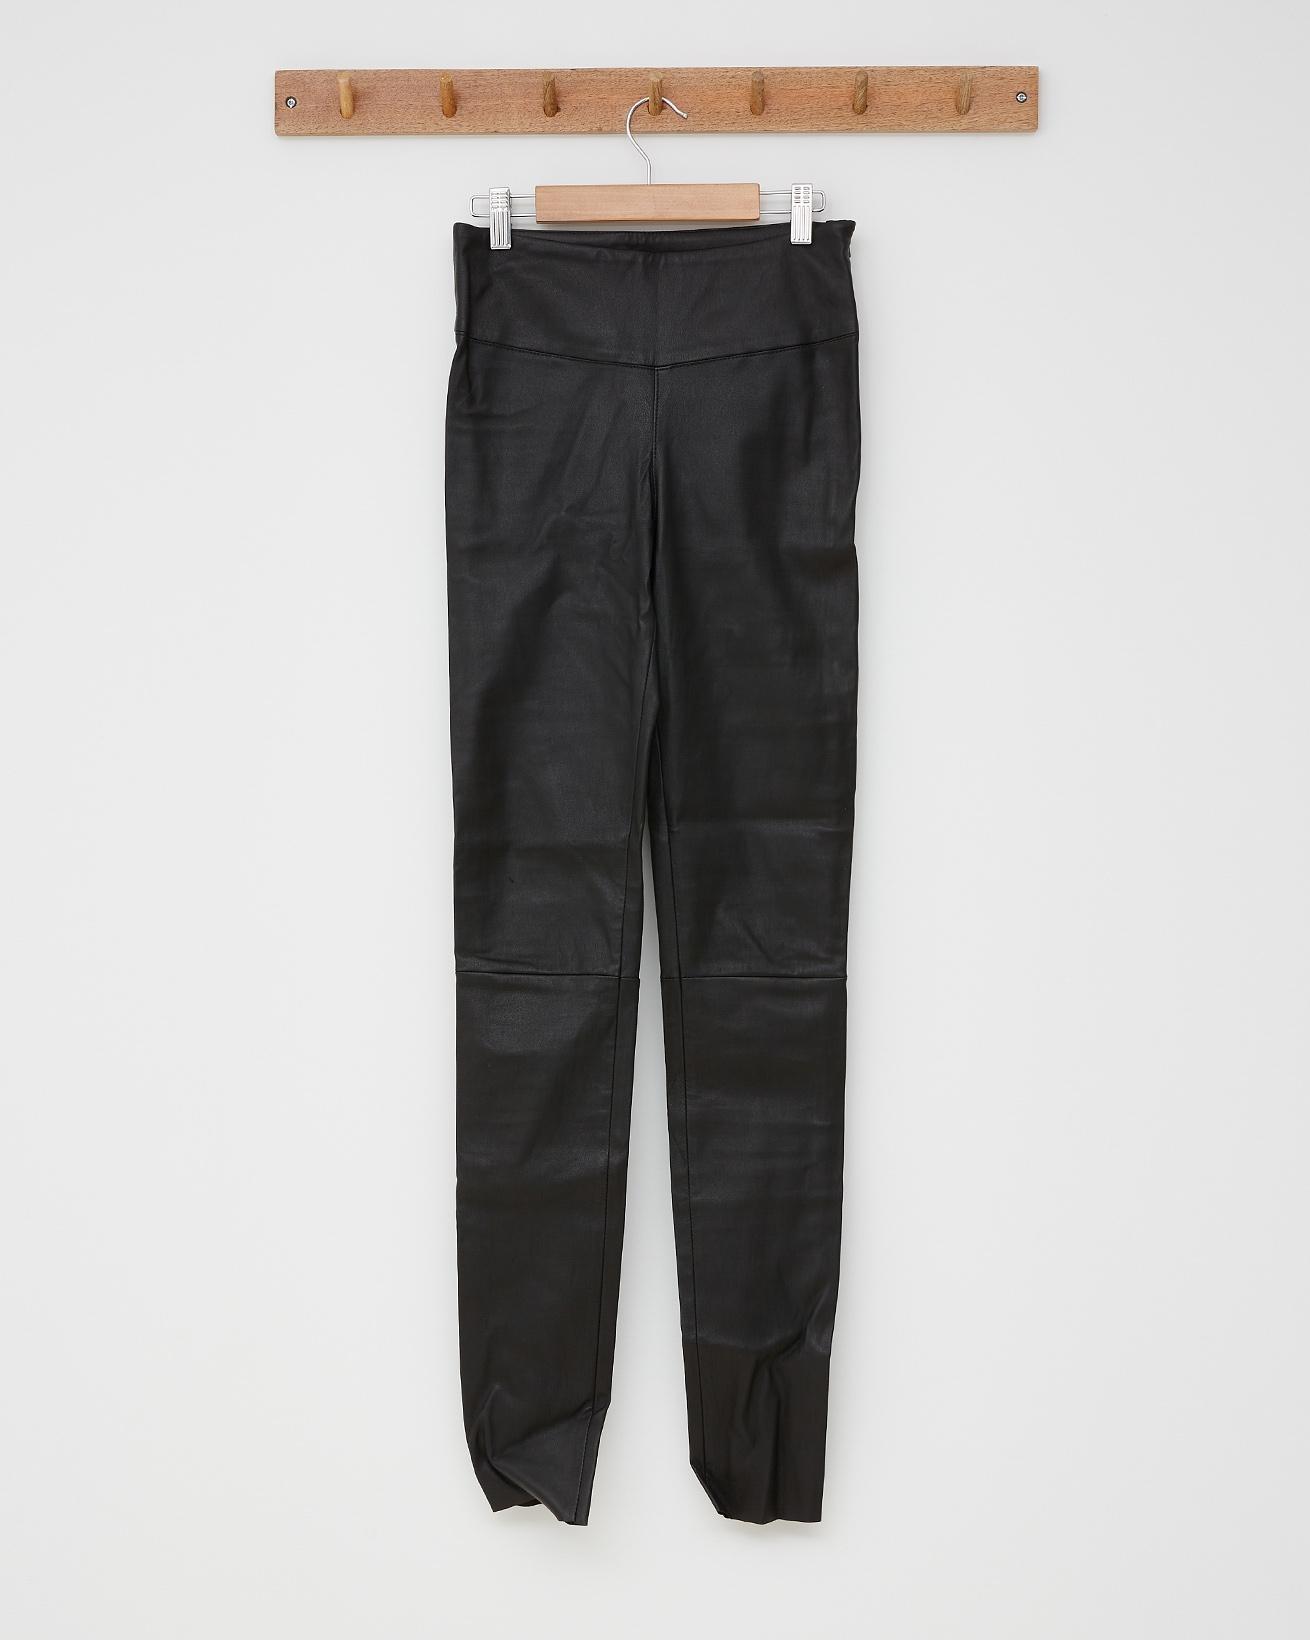 Stretch Leather Leggings - Black - Size 8 - 2556